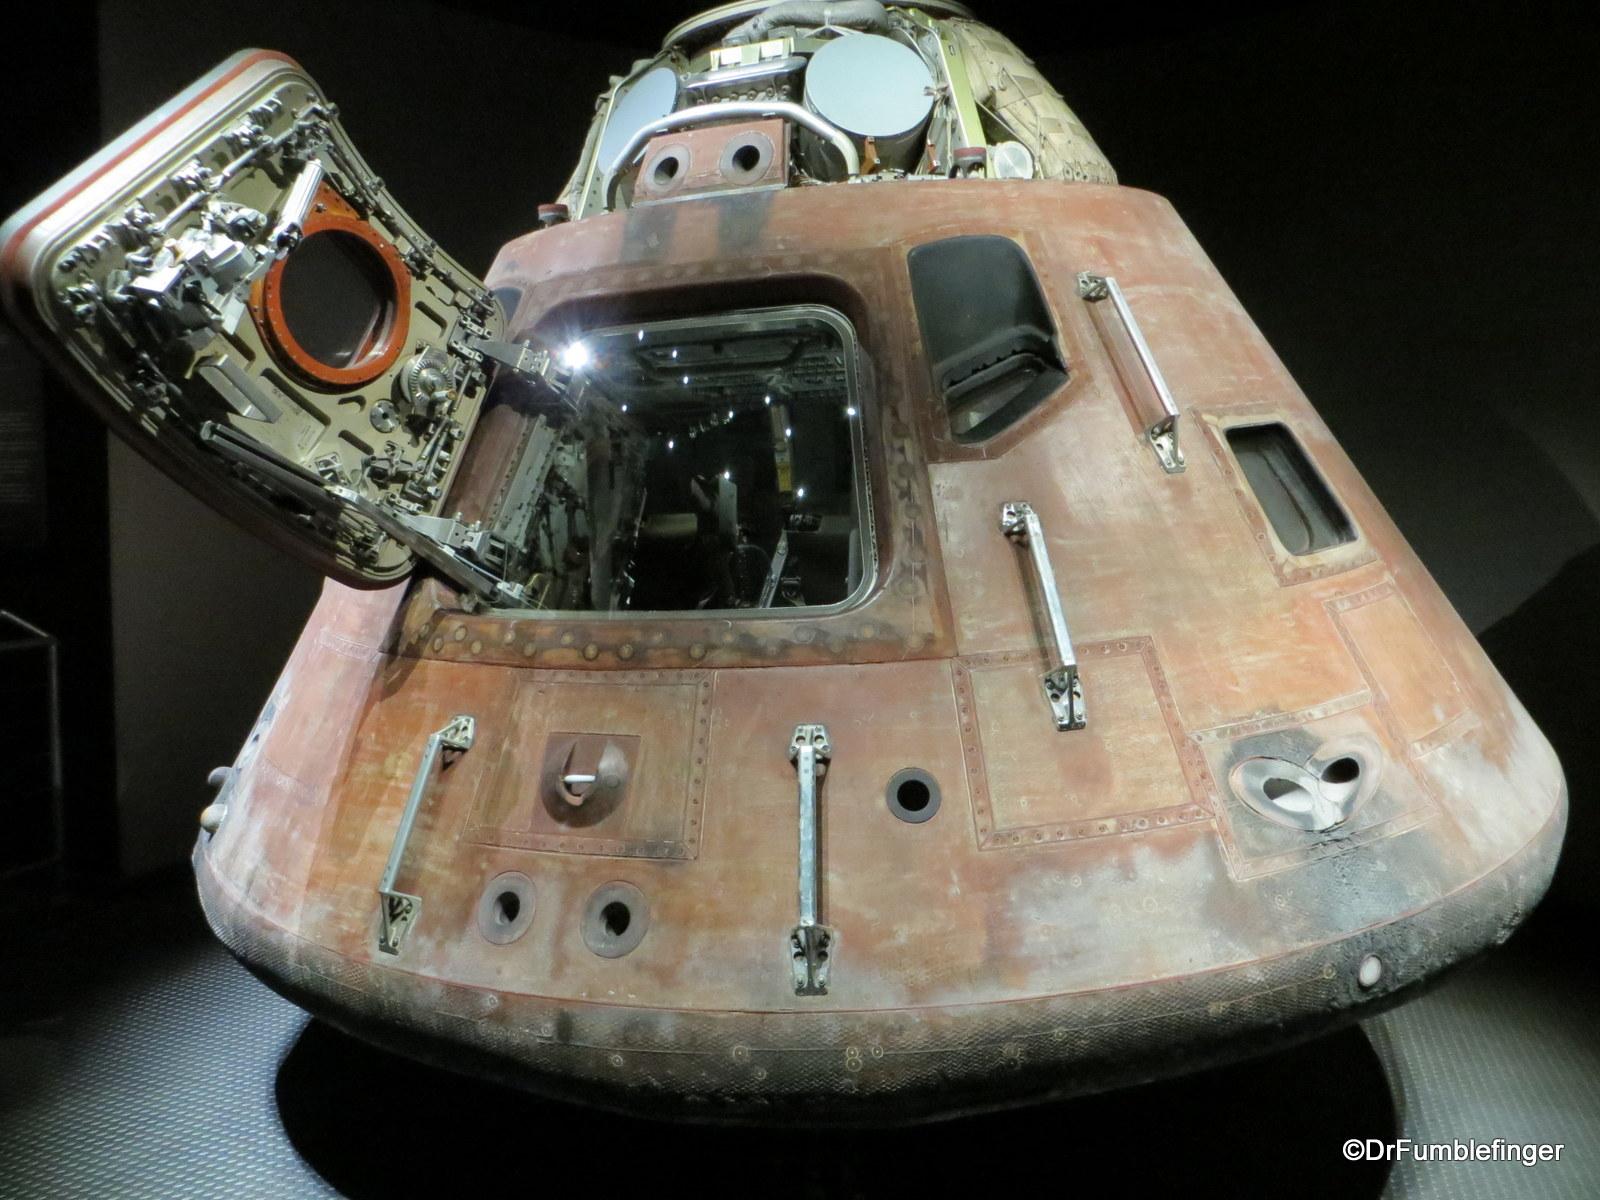 apollo 13 kennedy space center - photo #40